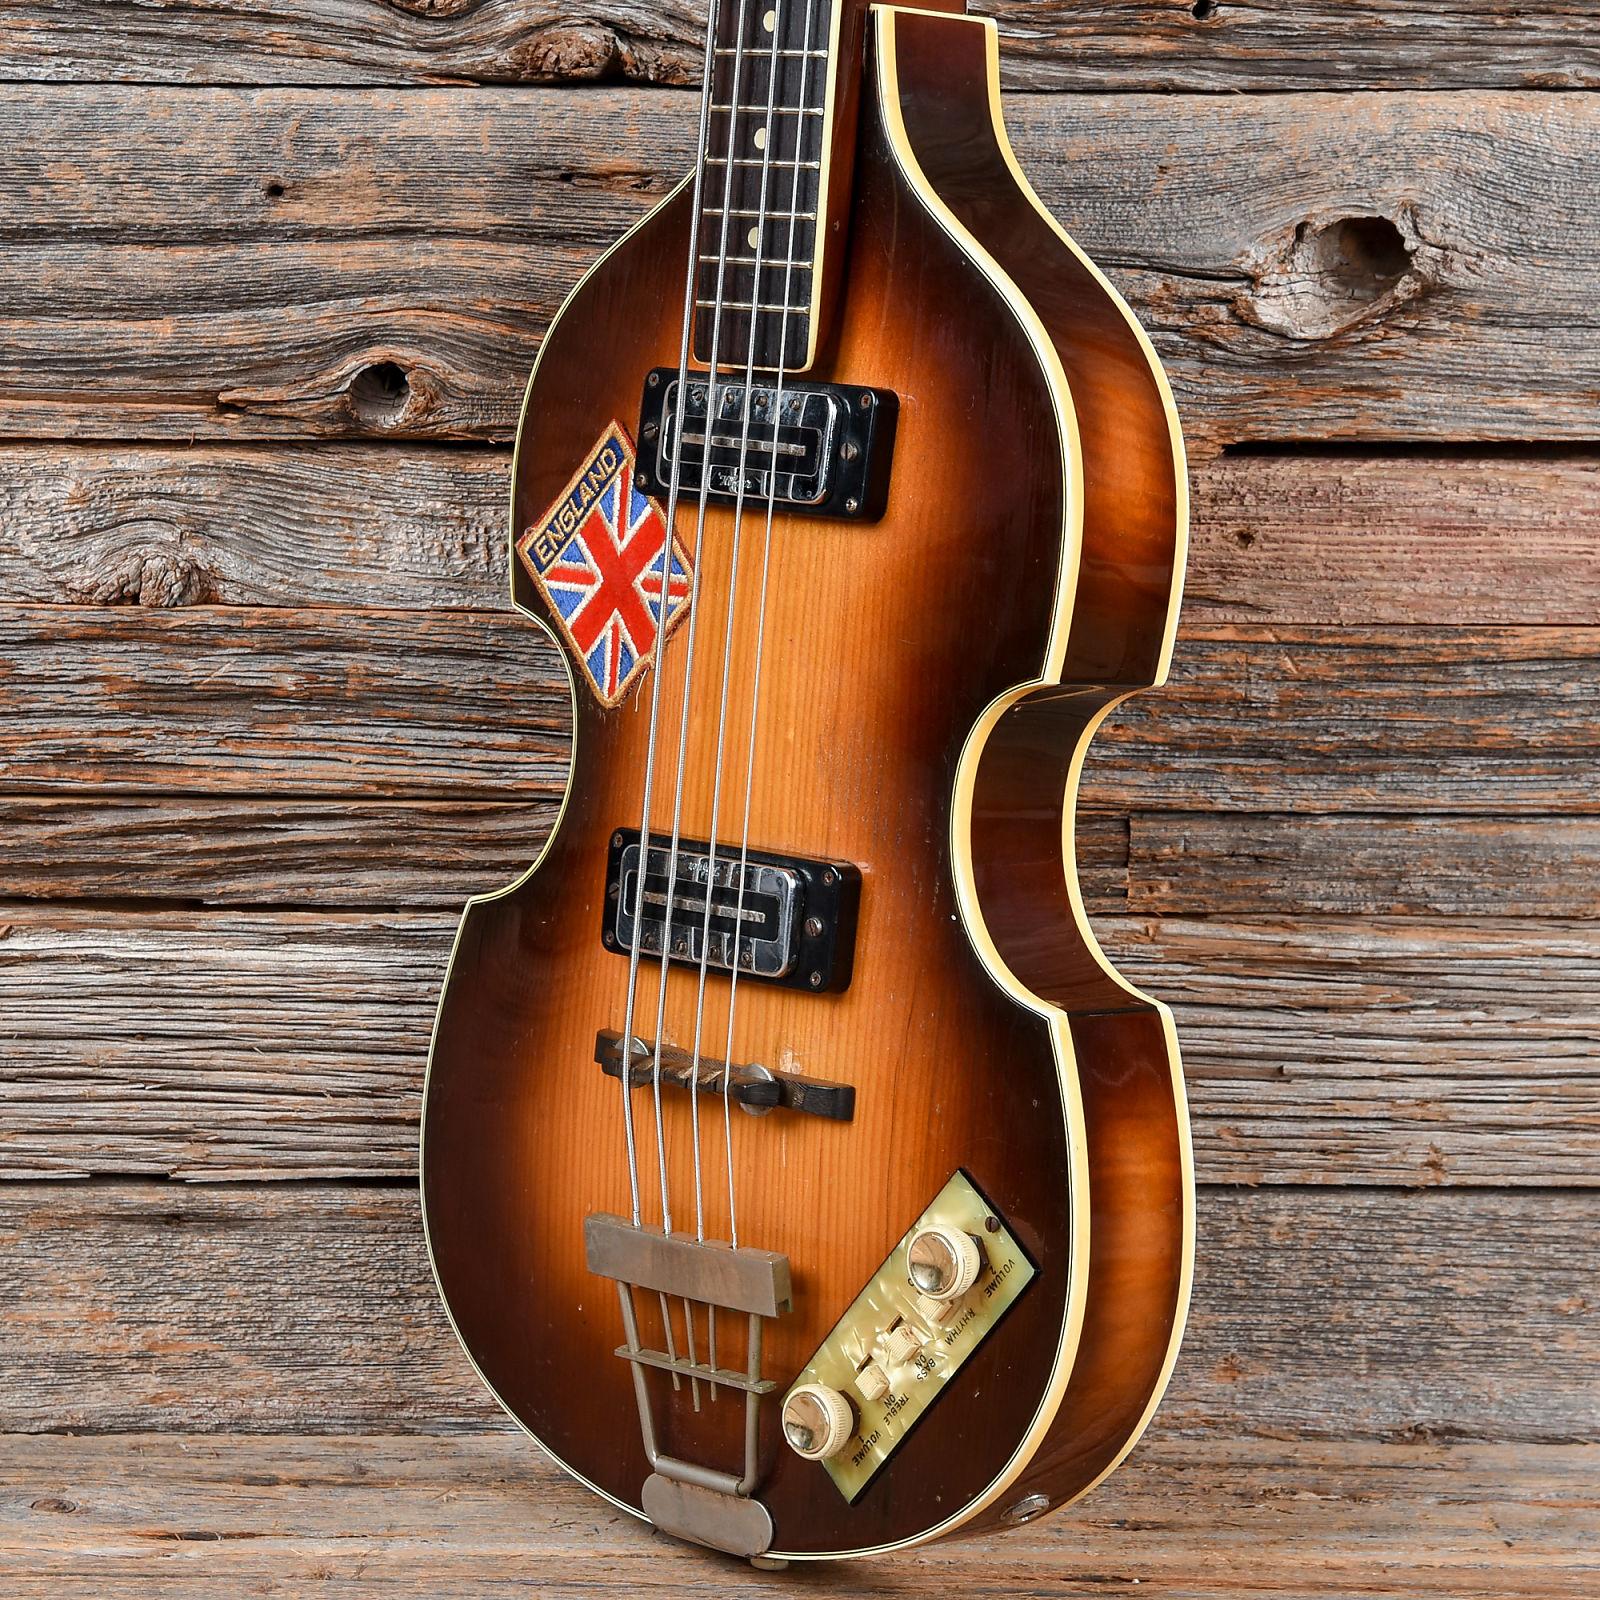 Hofner 500 1 Violin Bass Sunburst 1960s Used Guitar Wiring Diagram